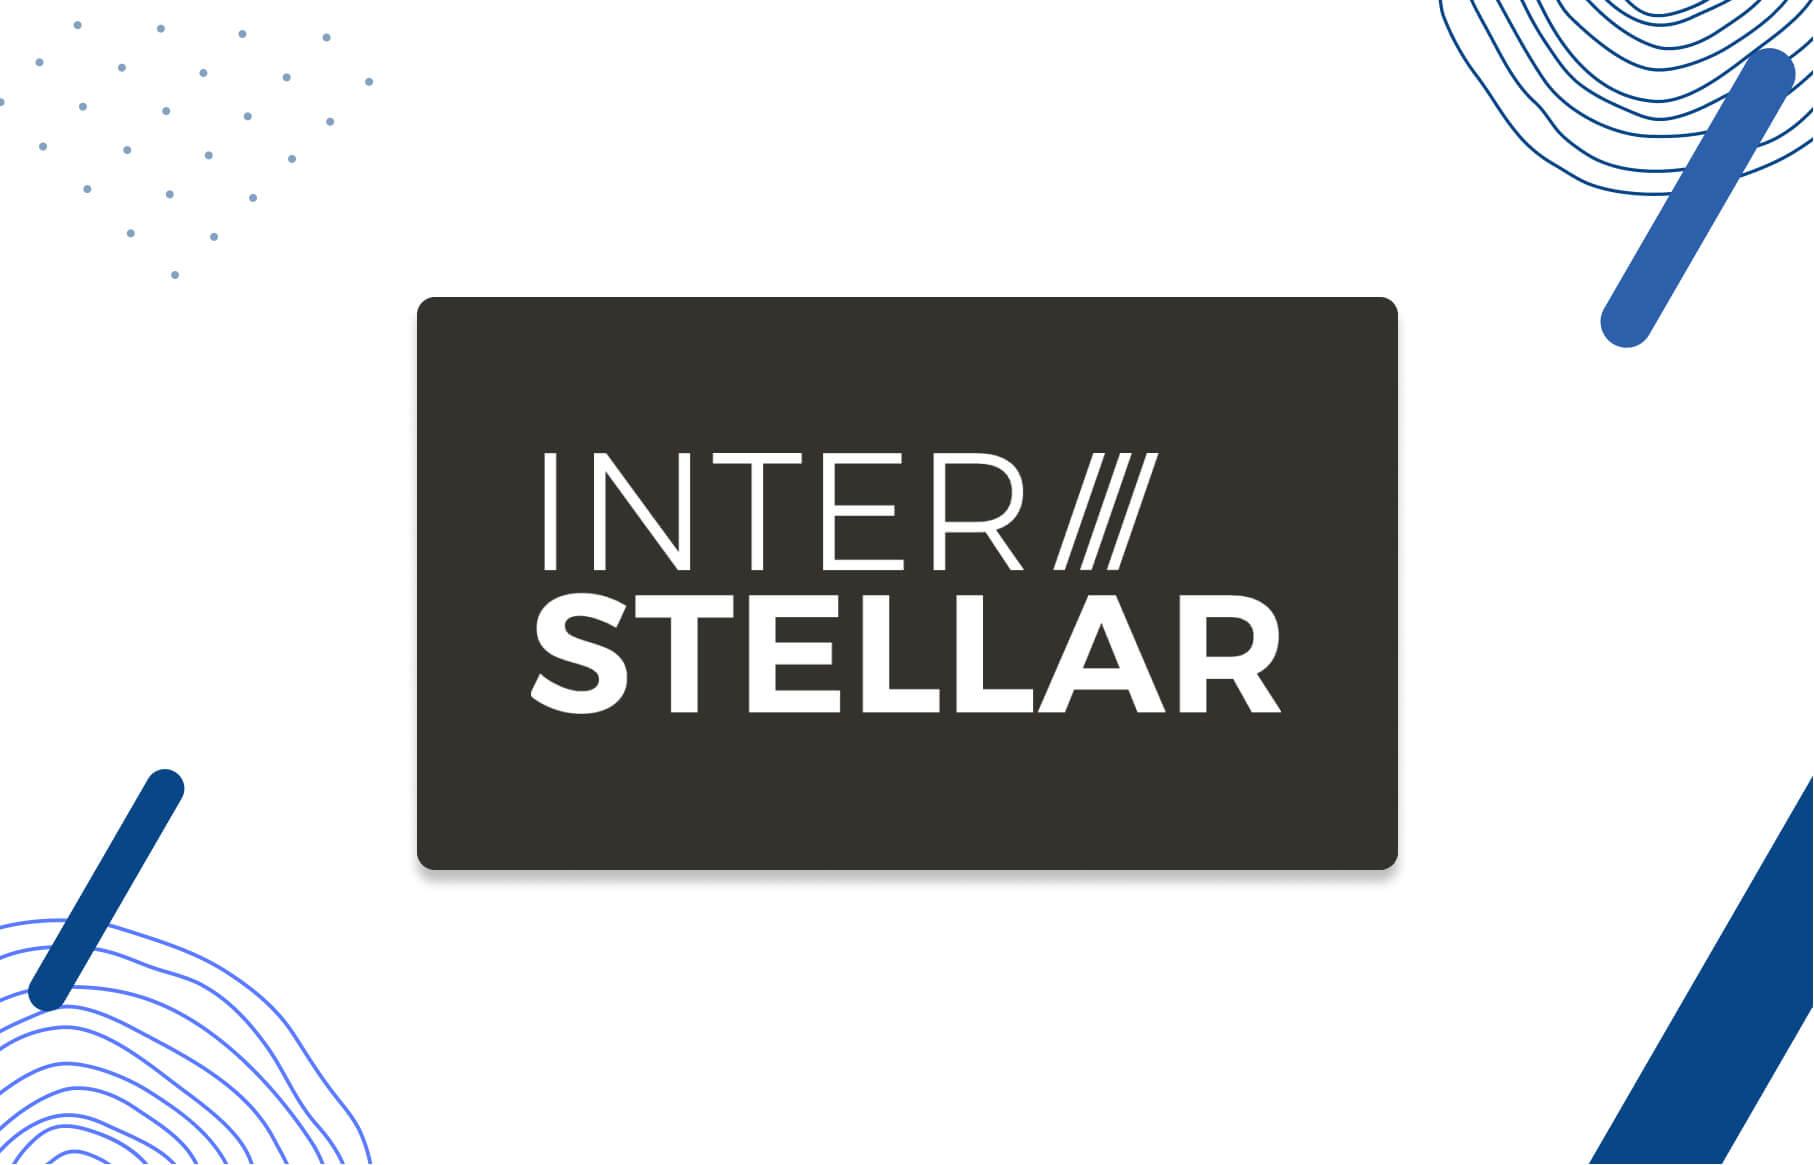 Interstellar Logo - STRATEGIC PLATFORMS AND PARTNERSHIPS